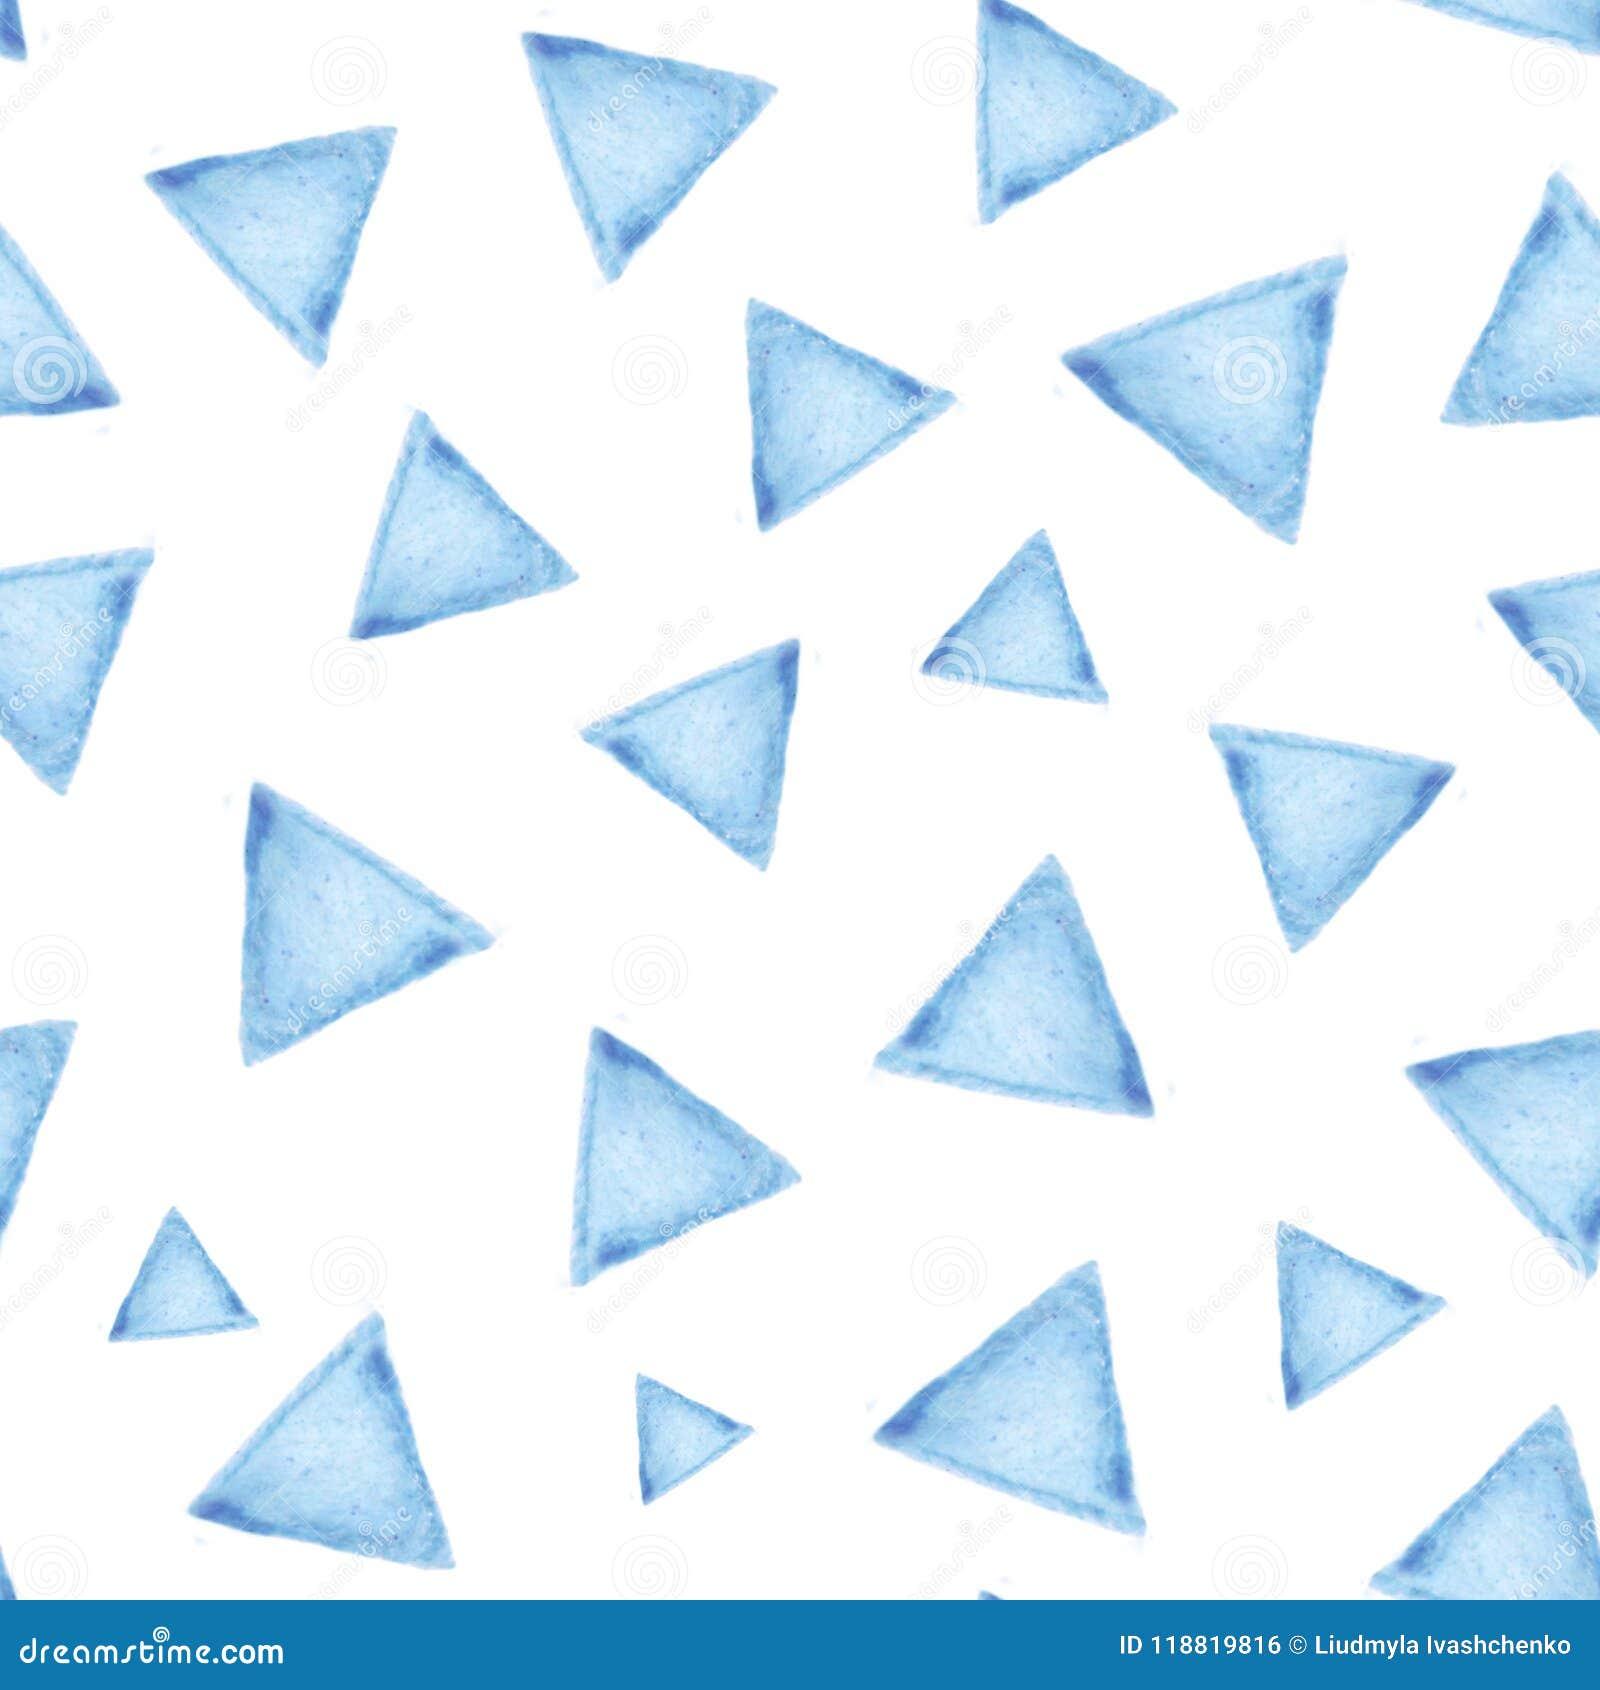 Naadloos patroon met blauwe driehoeken op witte achtergrond